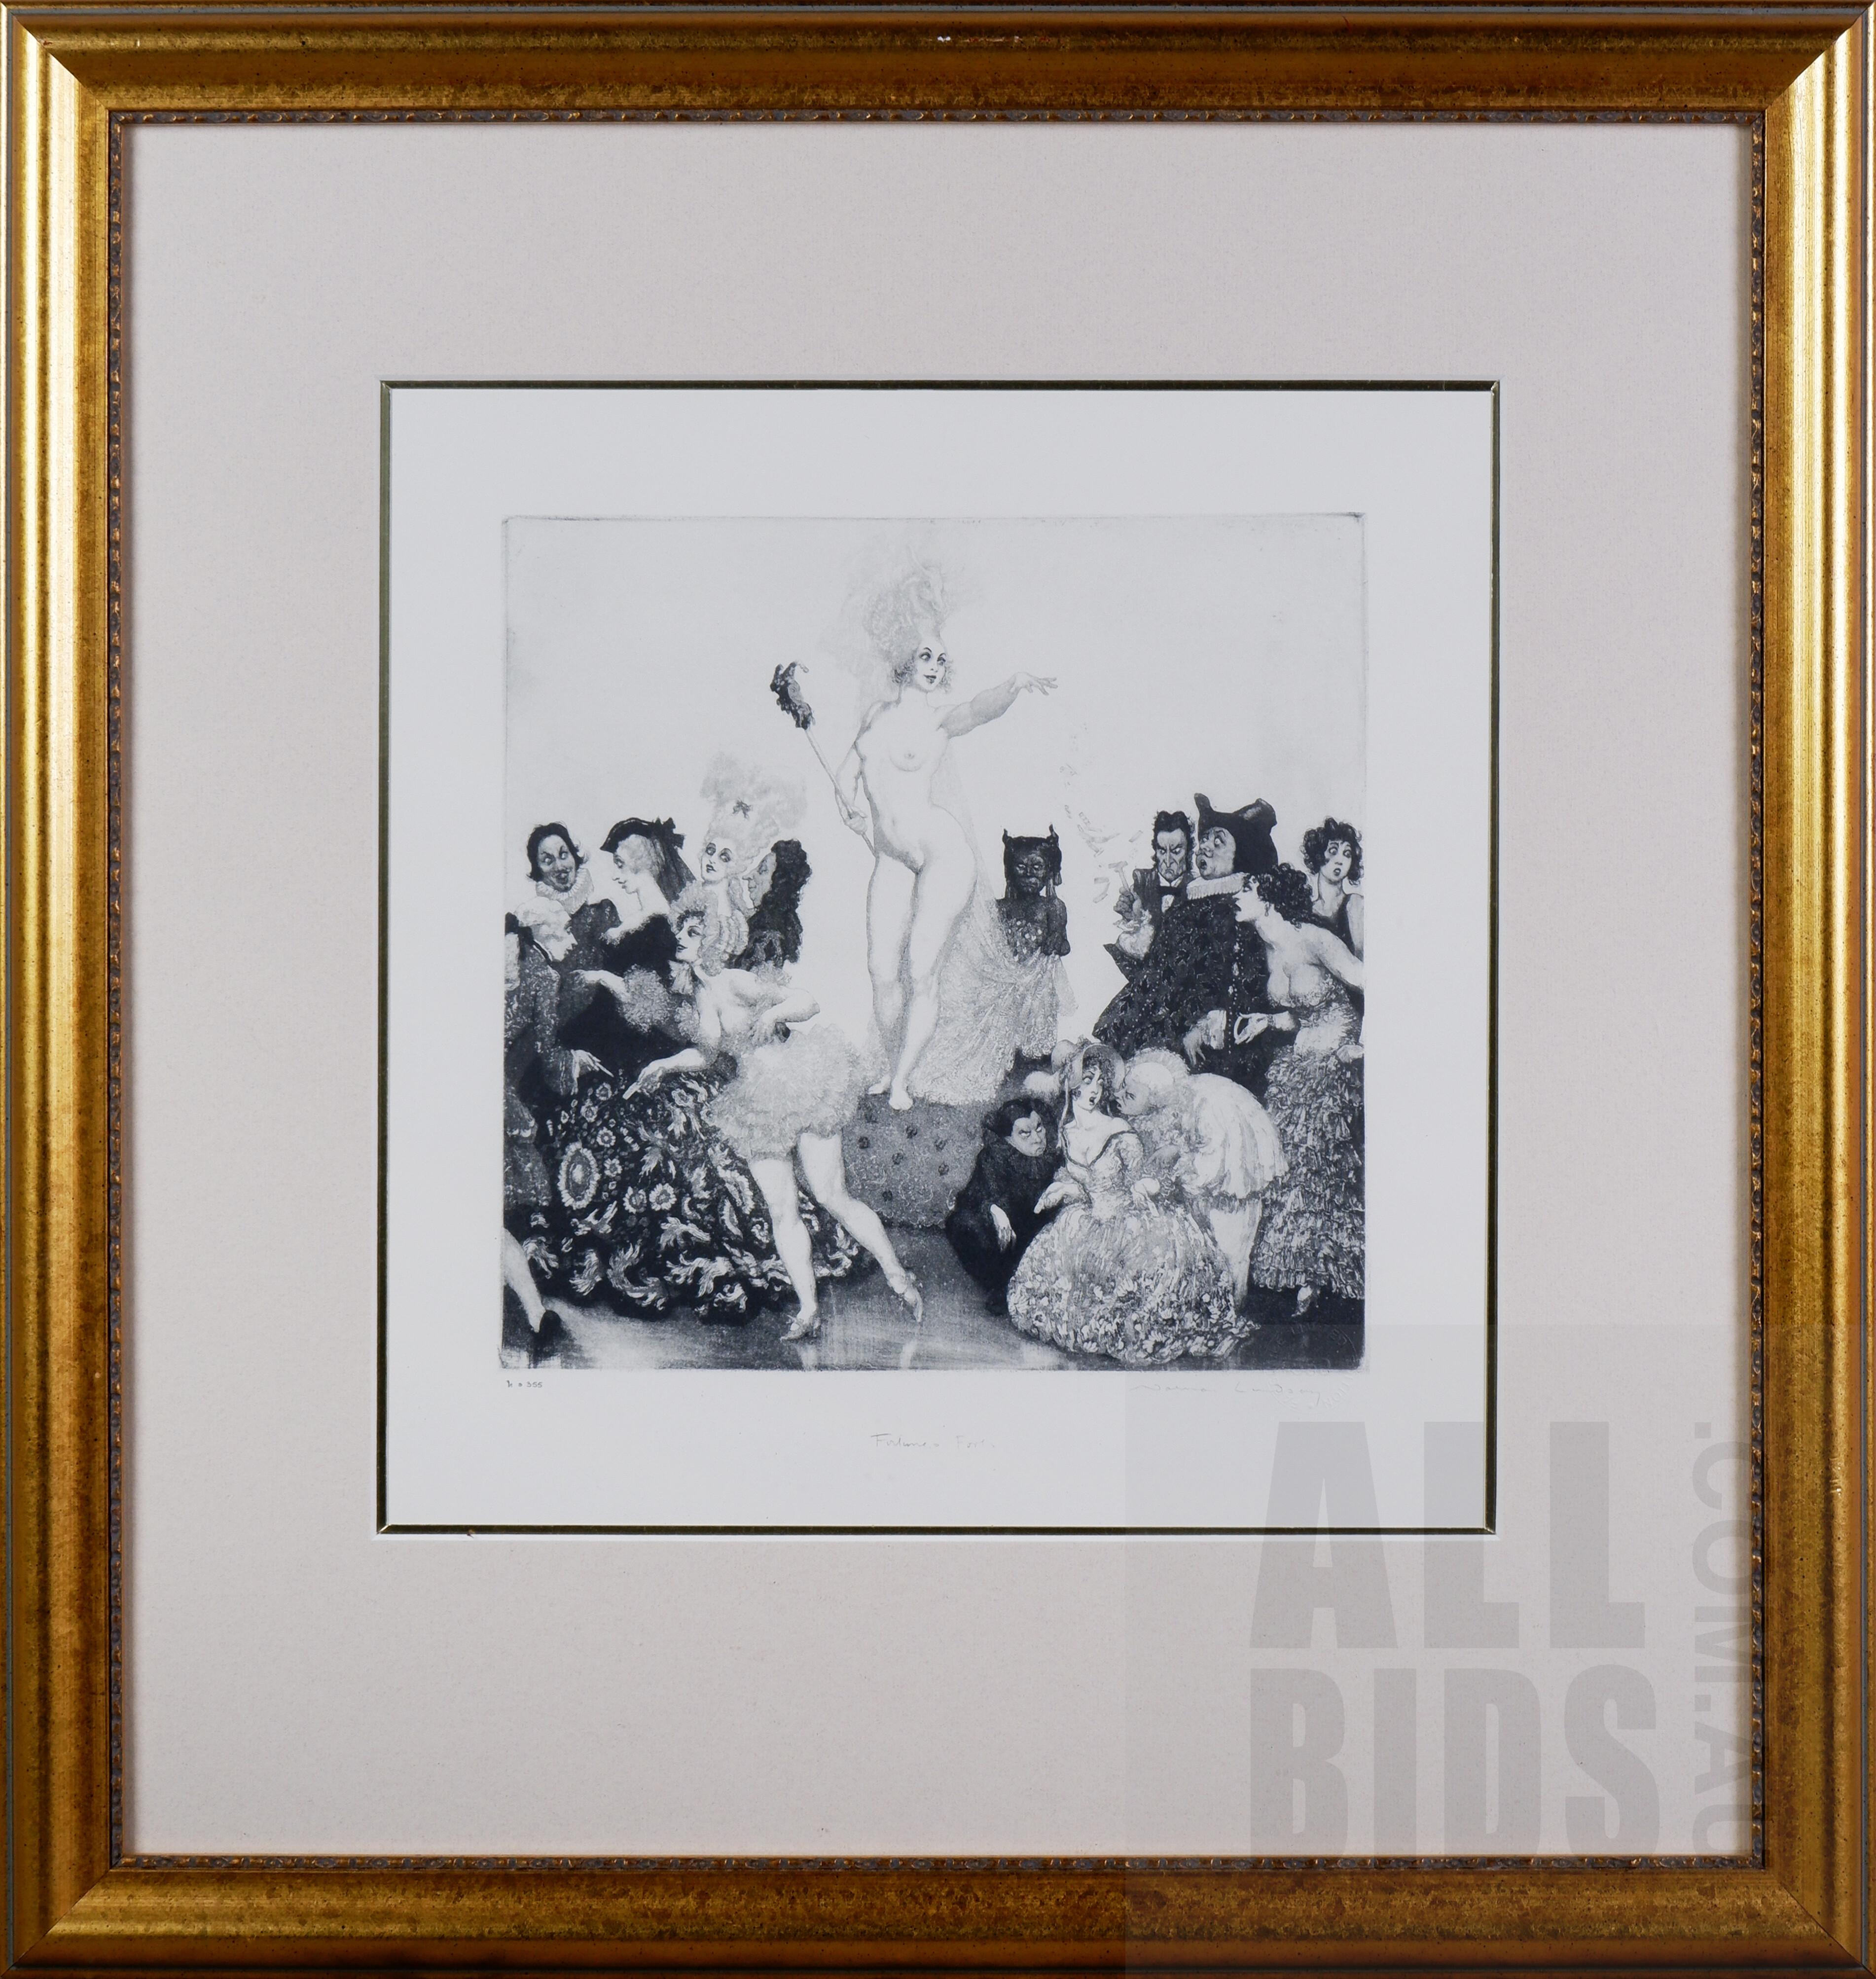 'Norman Lindsay (1879-1969), Fortunes Fools, Facsimile Etching, 25 x 25 cm'